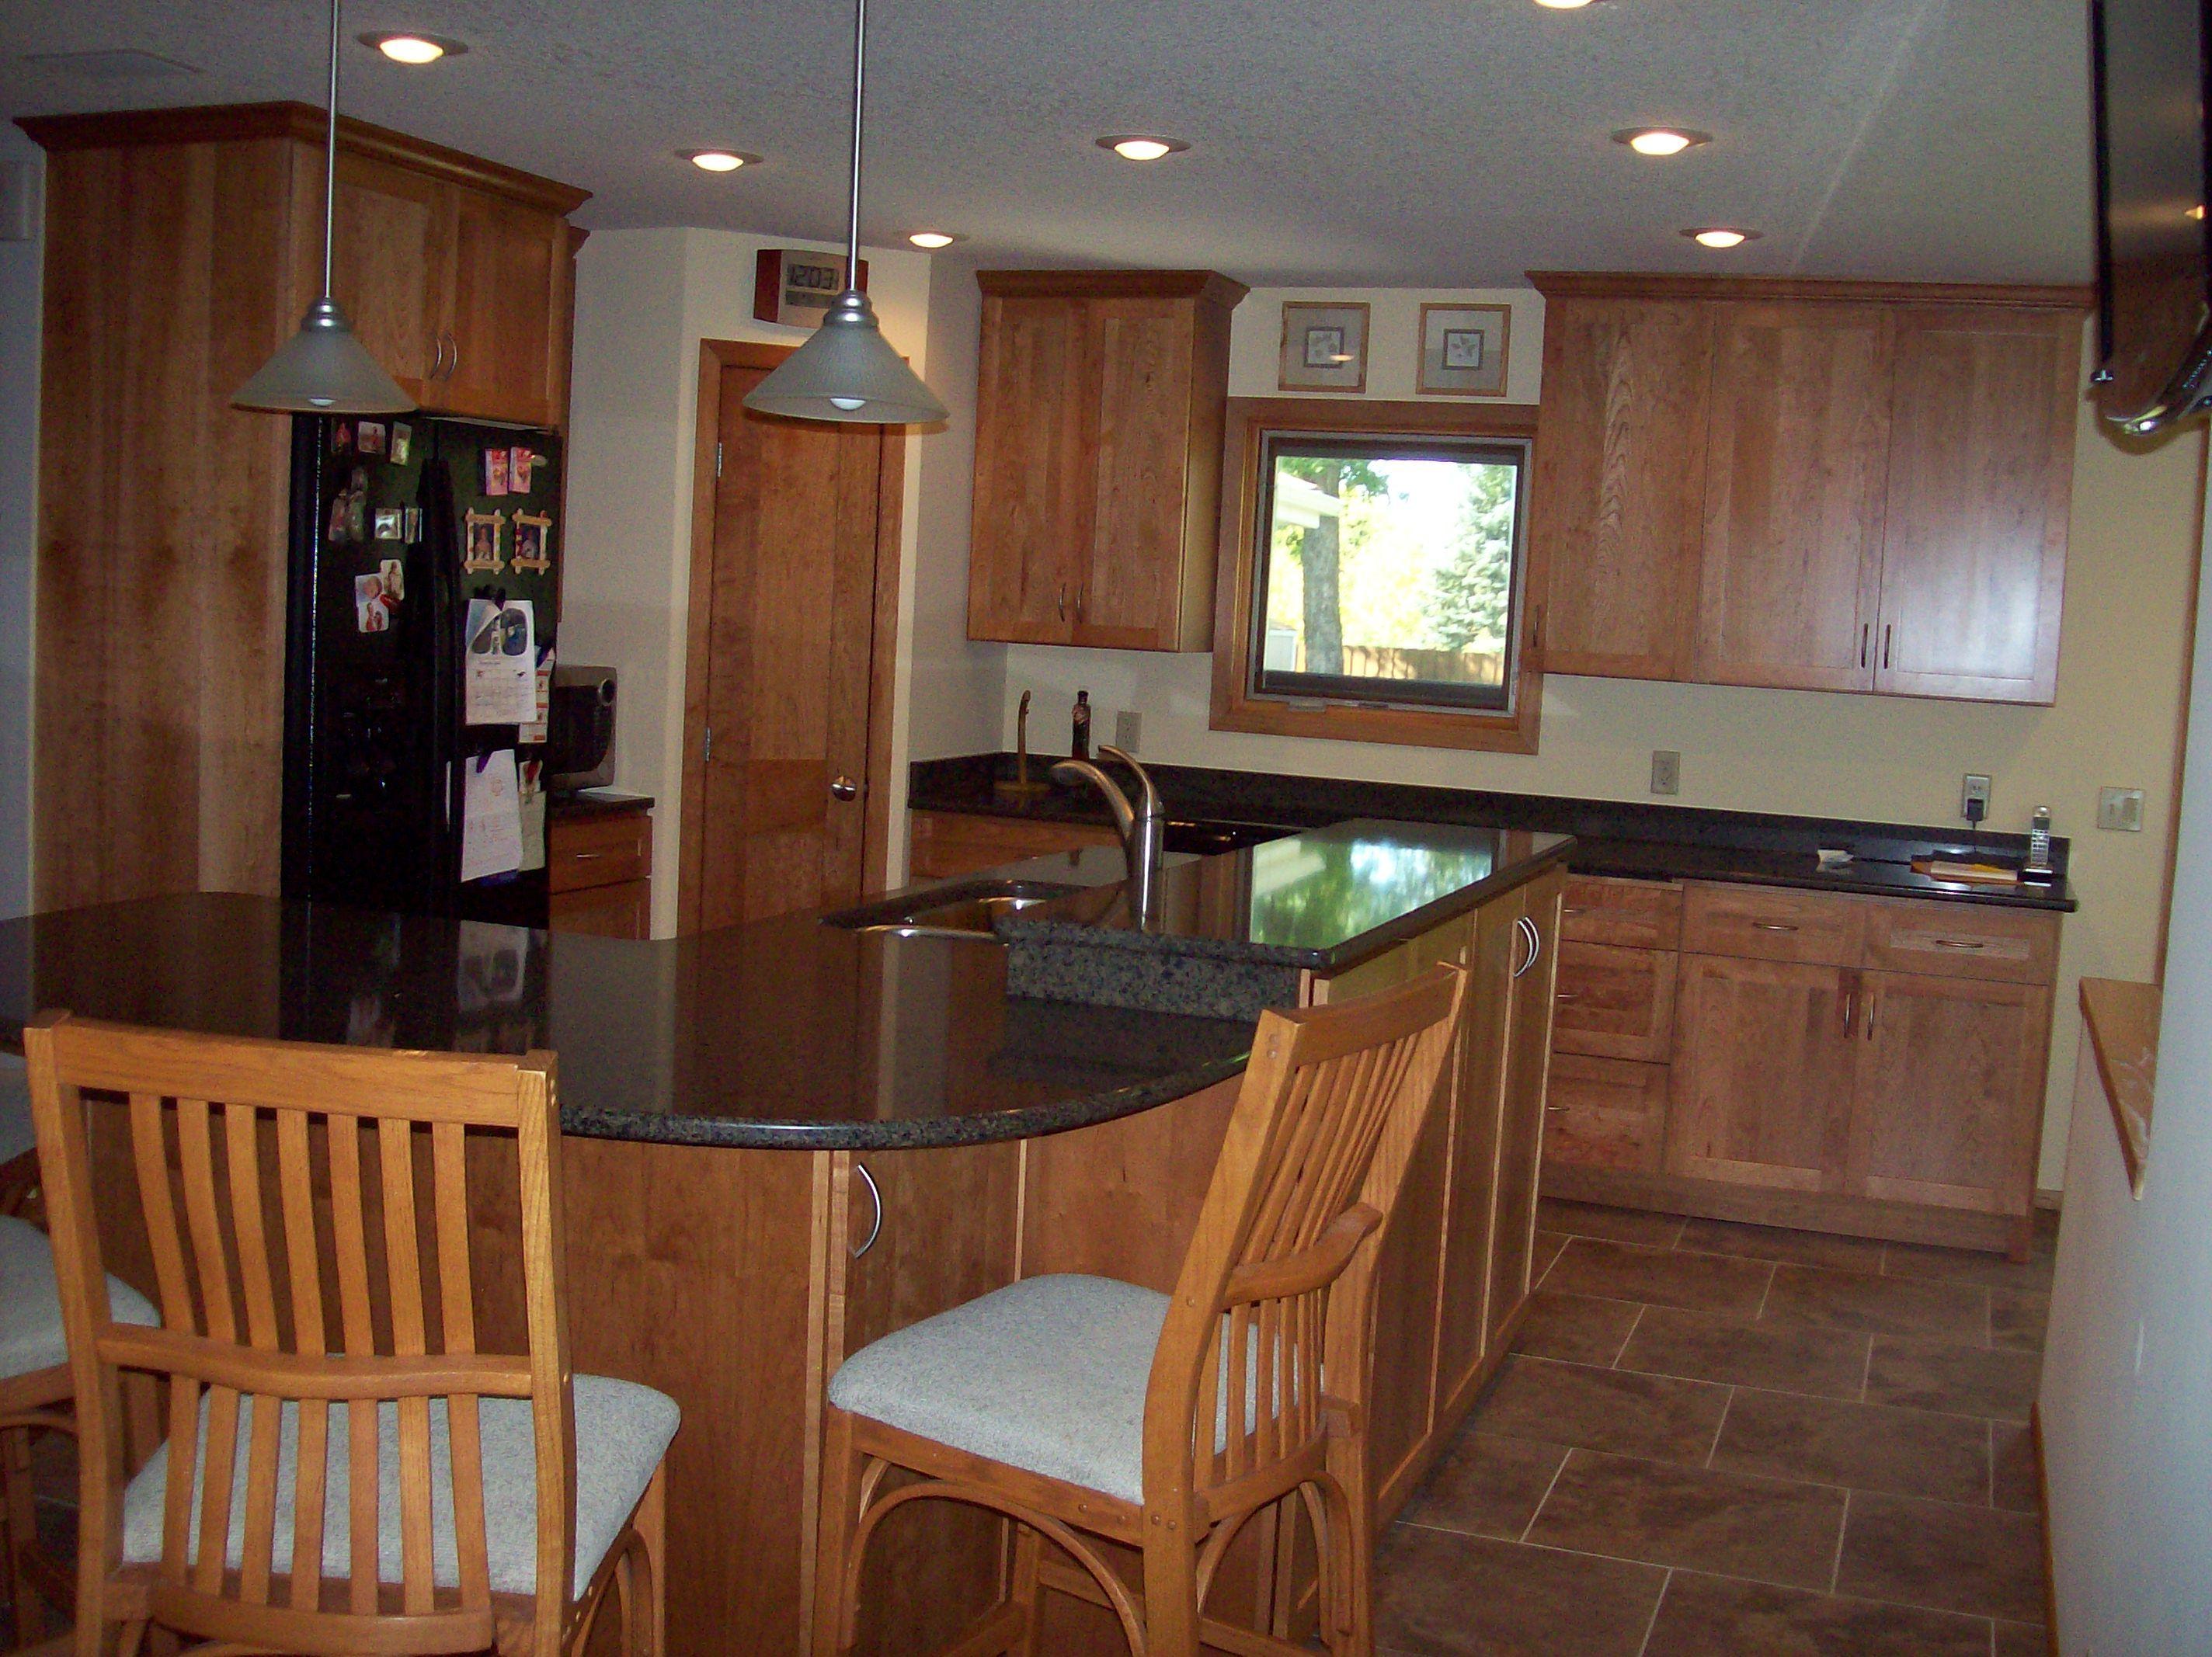 Complete Kitchen Remodel By Crask Homes & Design ...